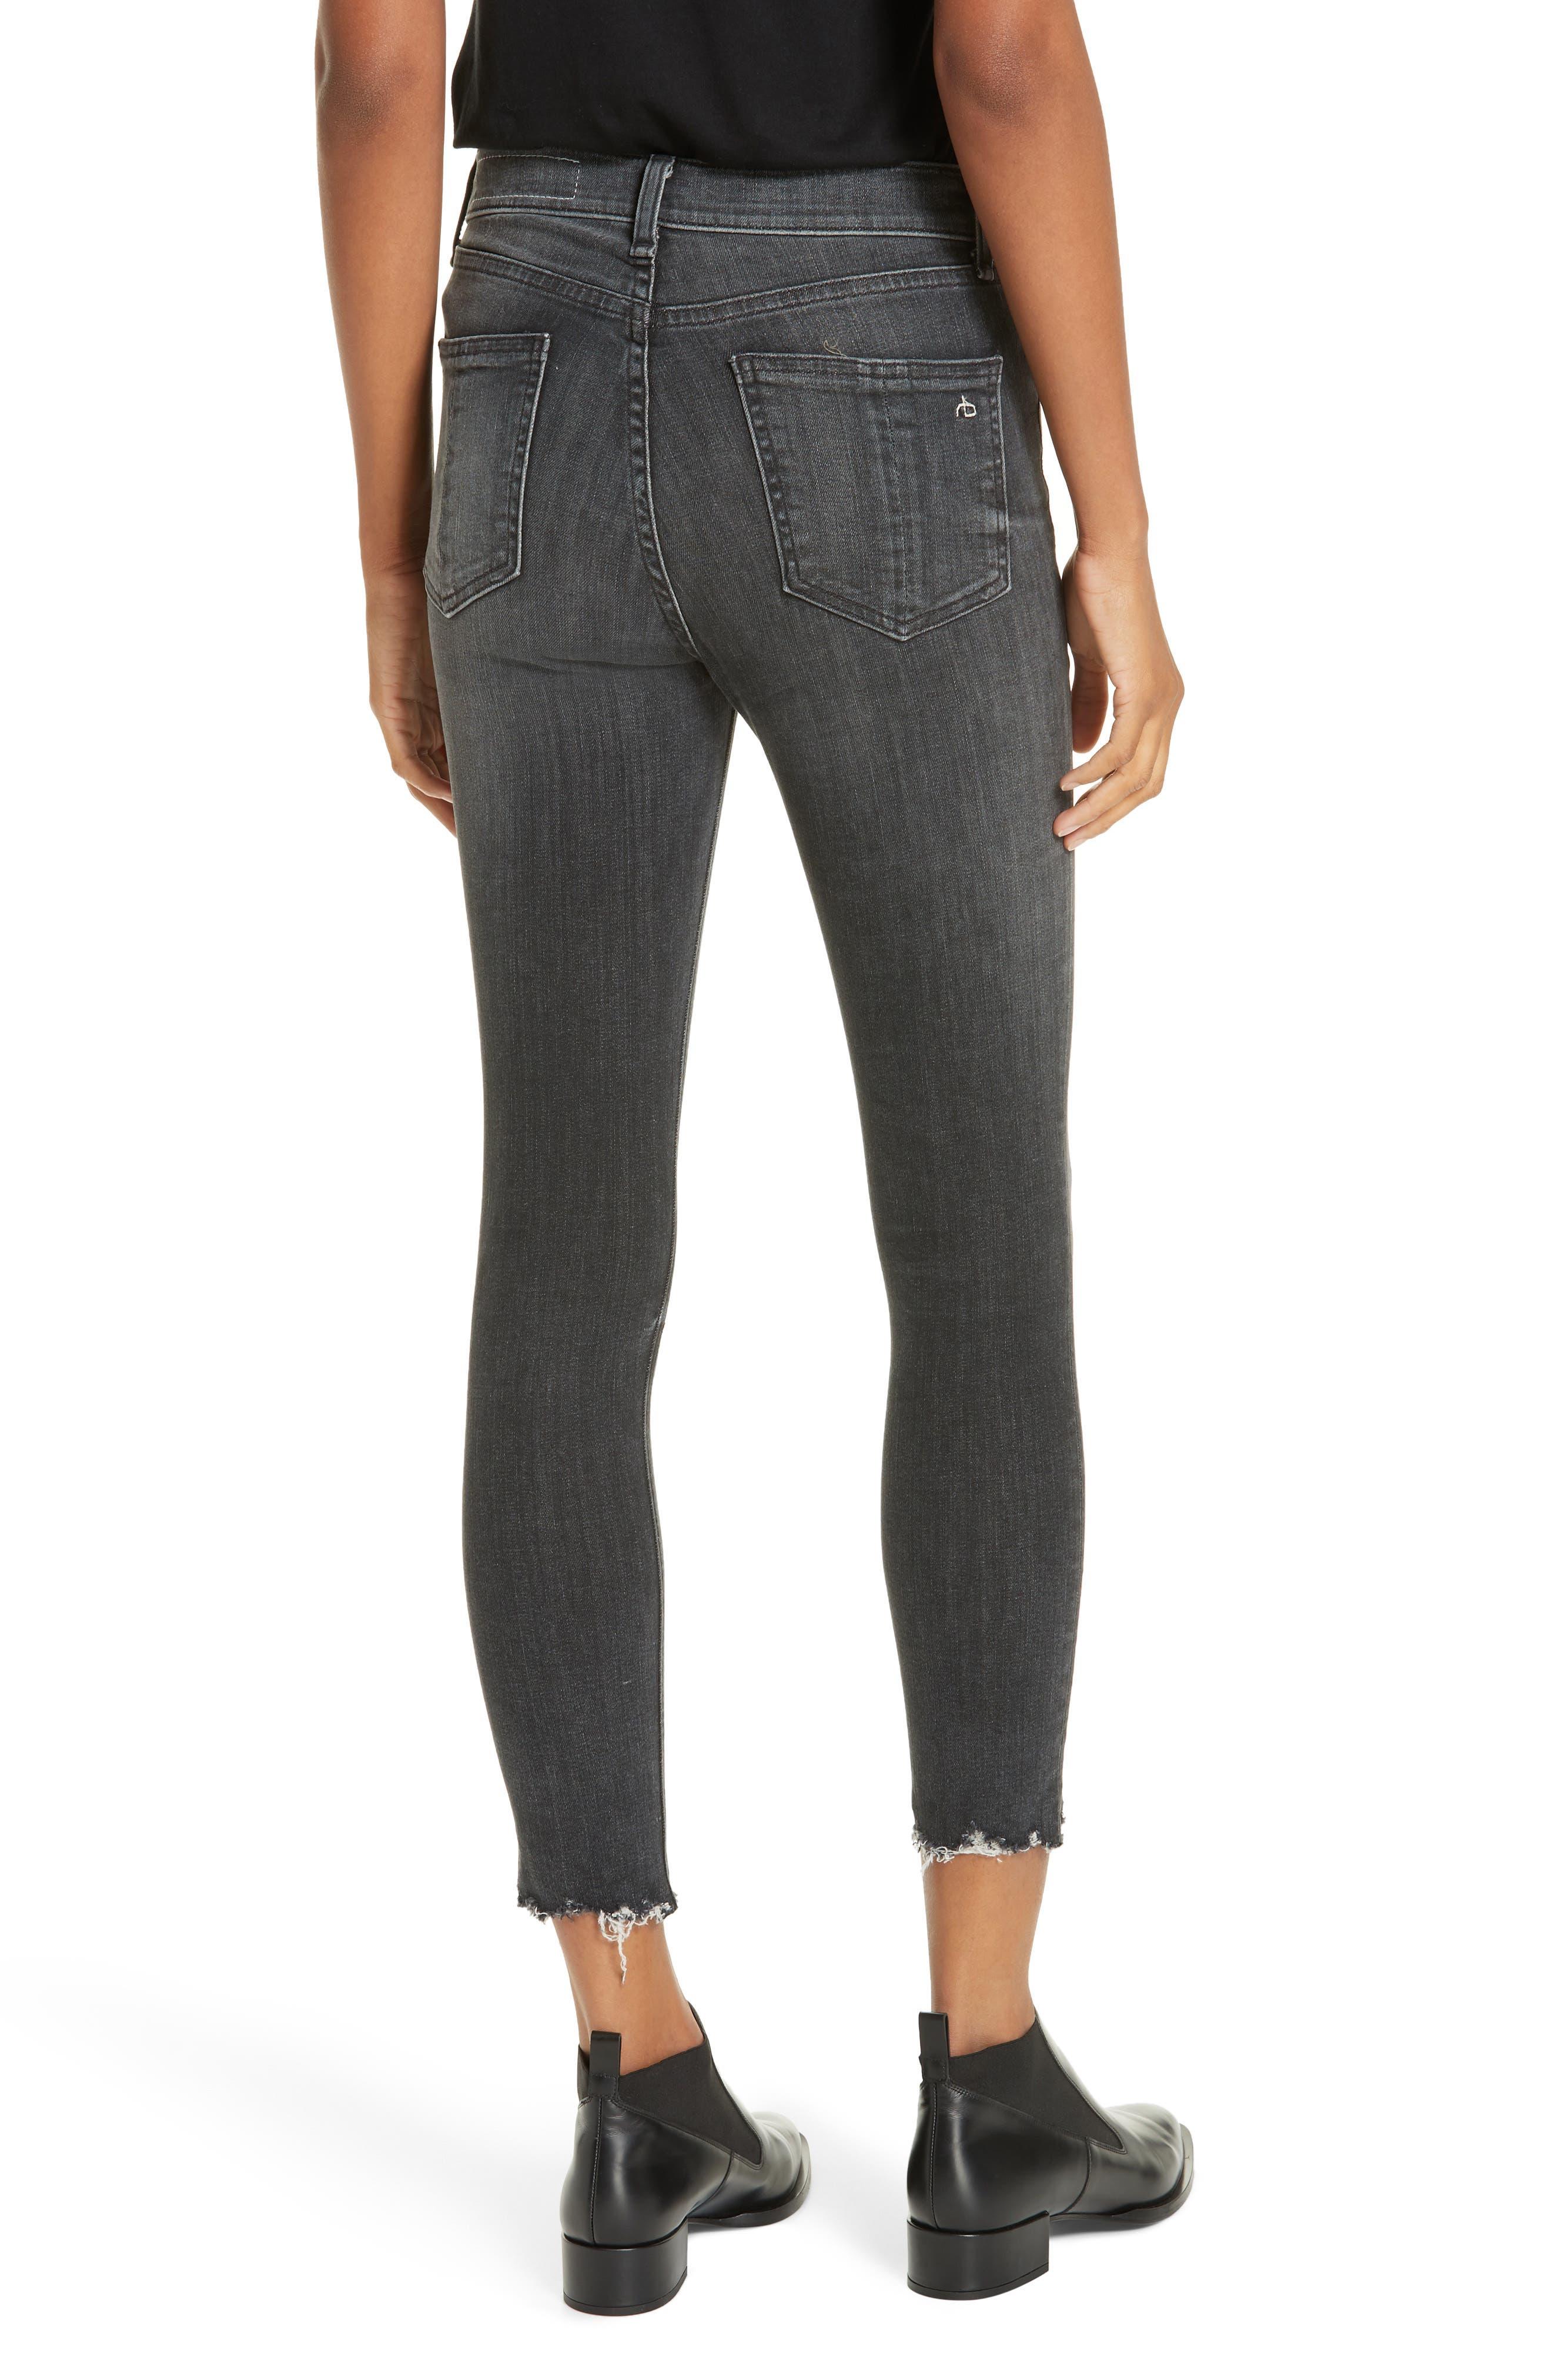 RAG & BONE, High Waist Raw Hem Crop Skinny Jeans, Alternate thumbnail 2, color, BRANDI